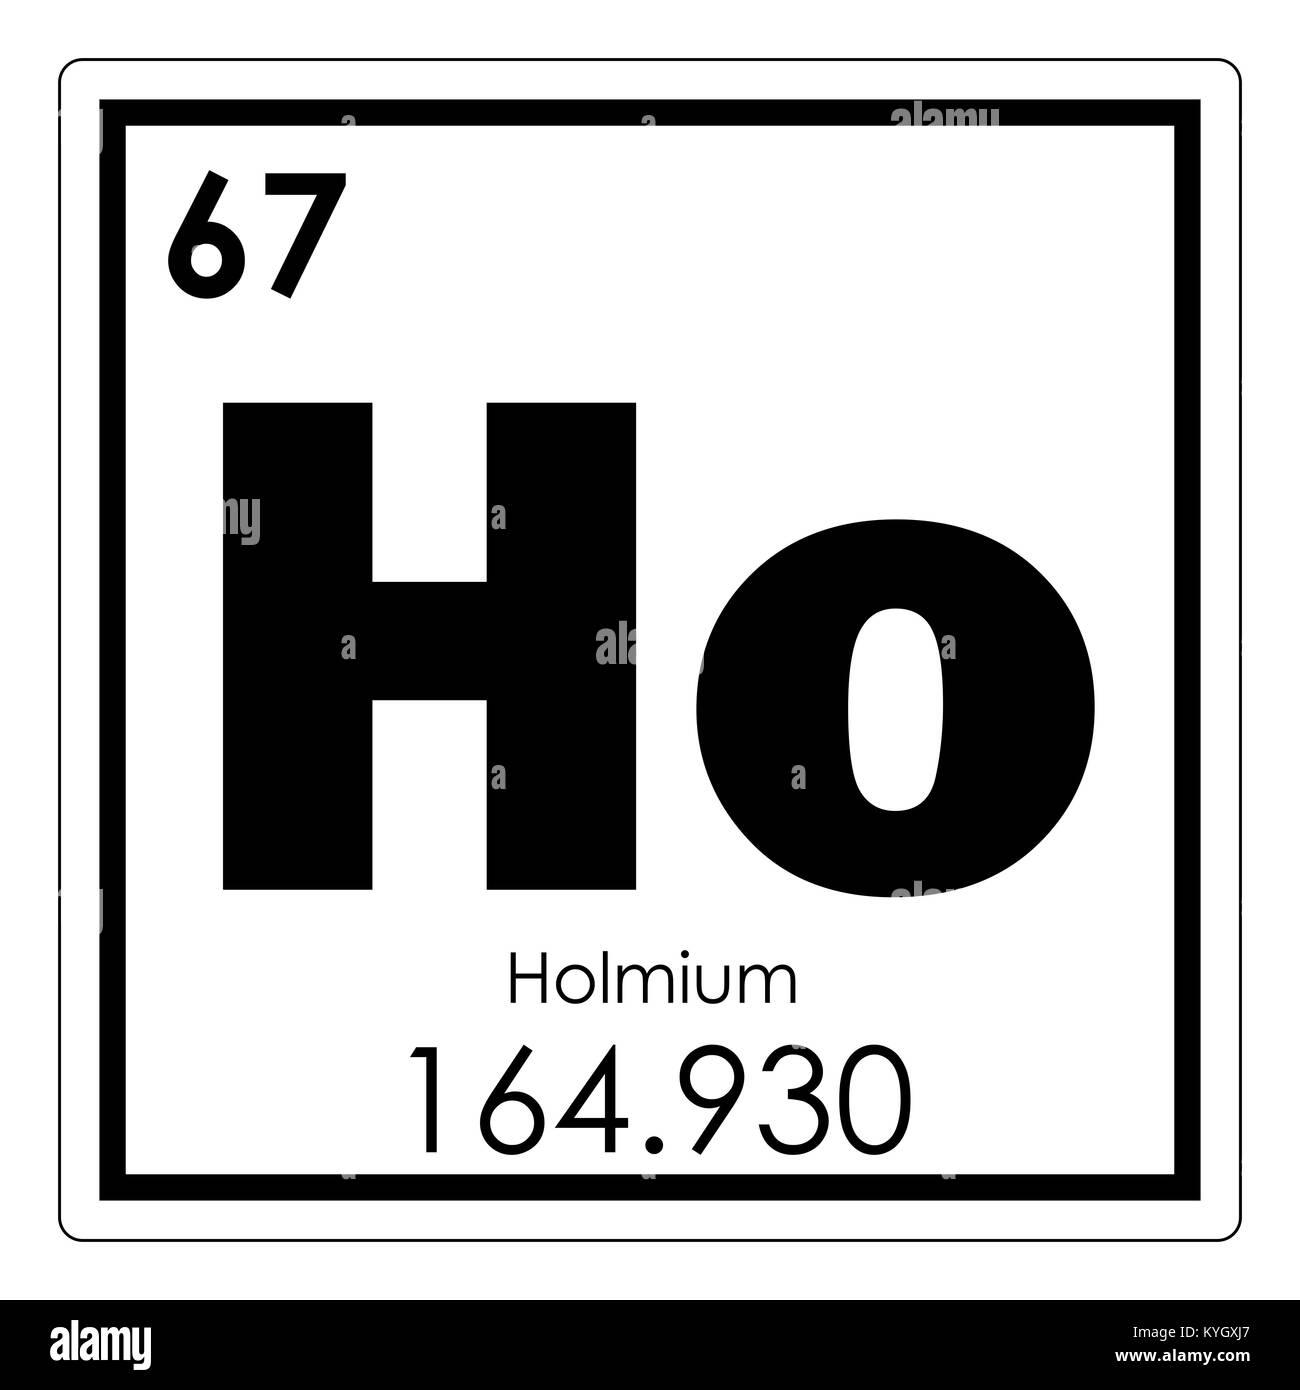 Holmium Chemical Element Periodic Table Science Symbol Stock Photo